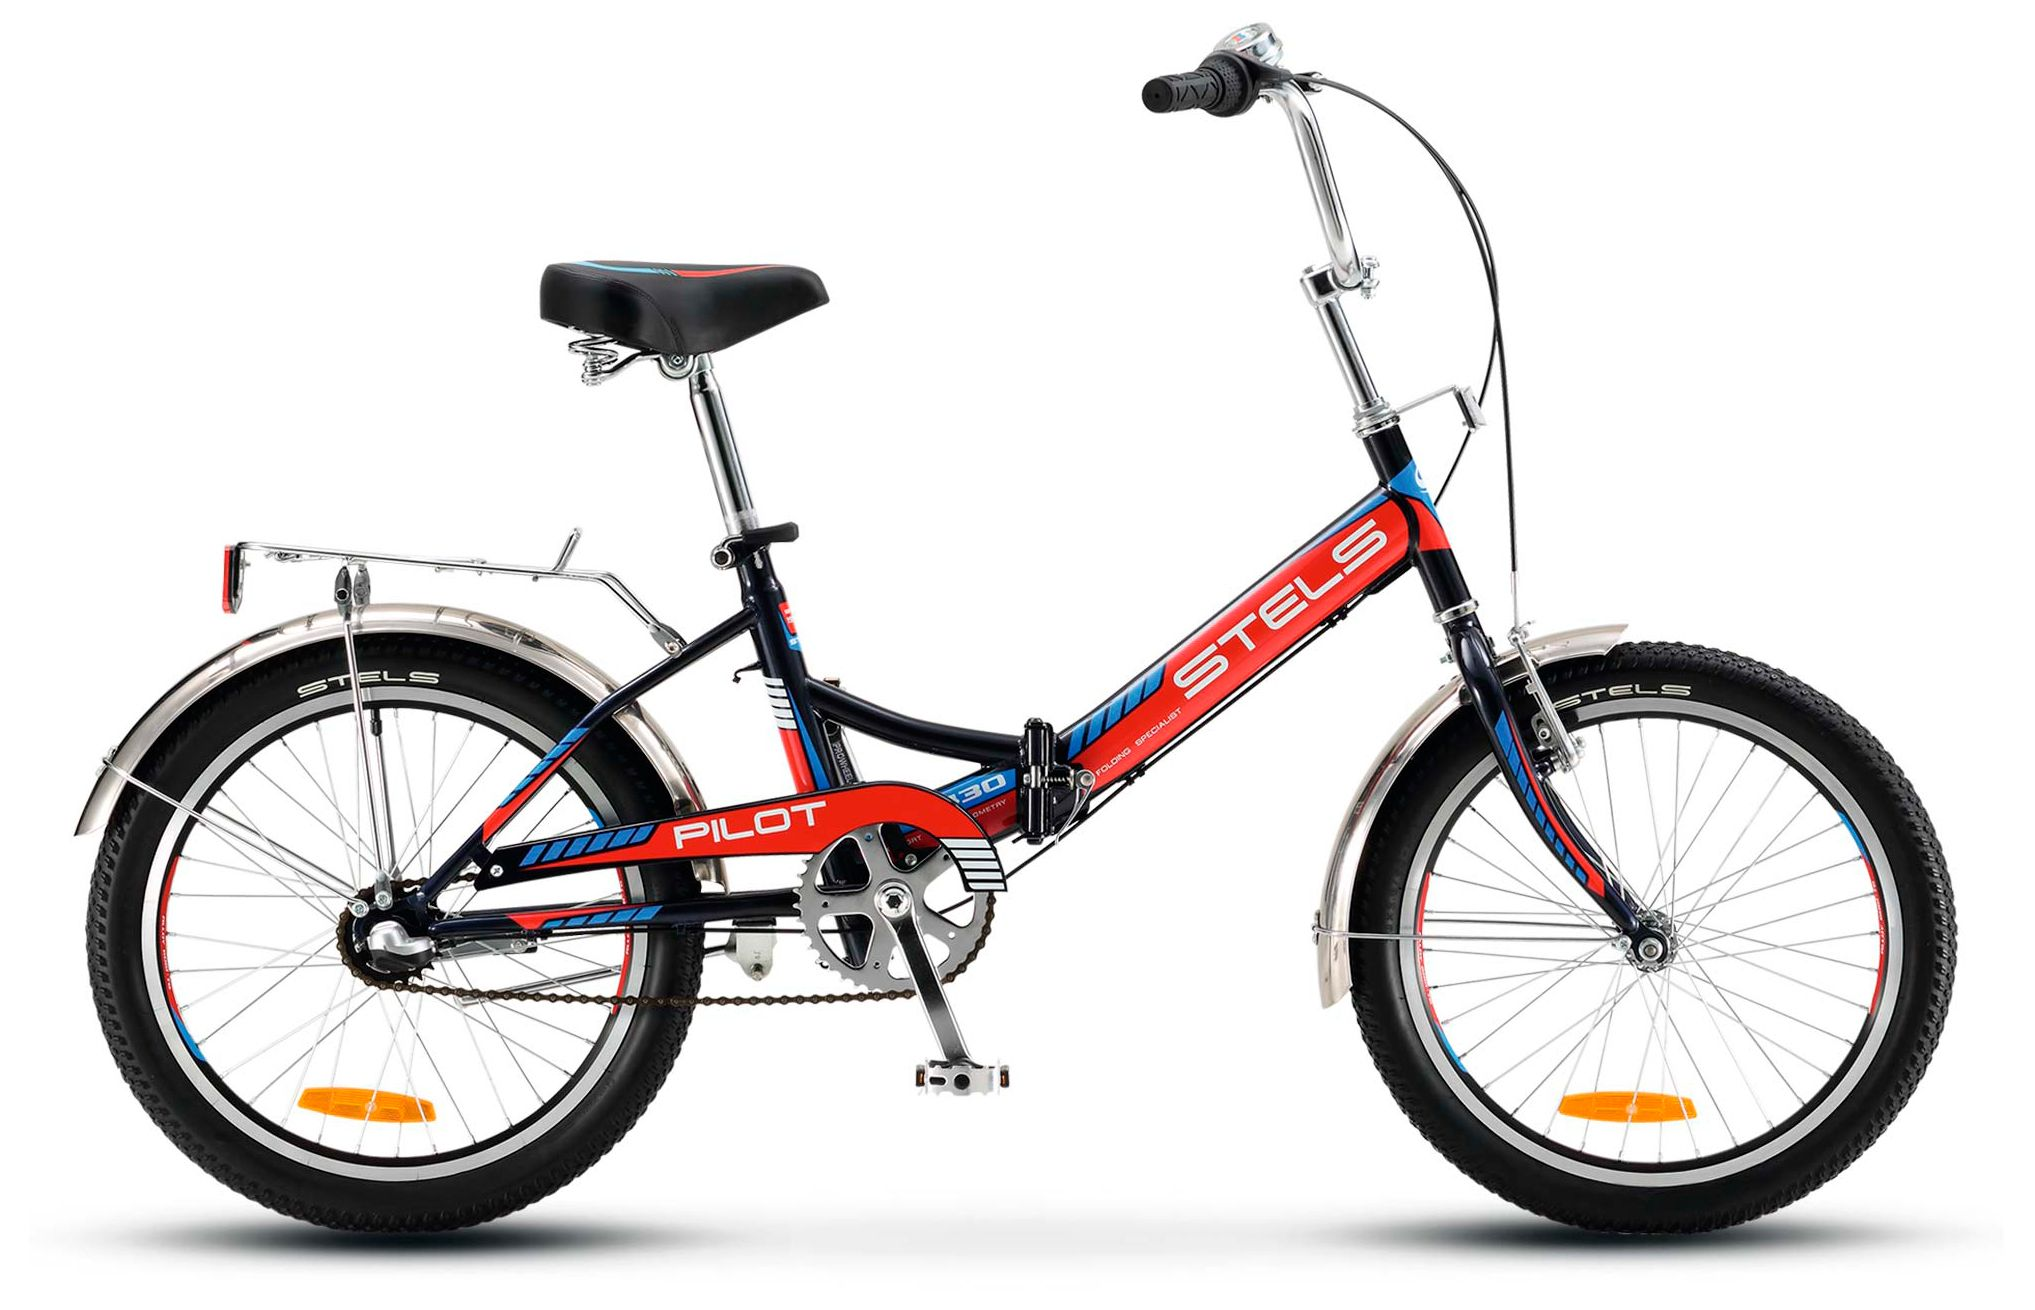 Велосипед Stels Pilot 430 (V010) 2017